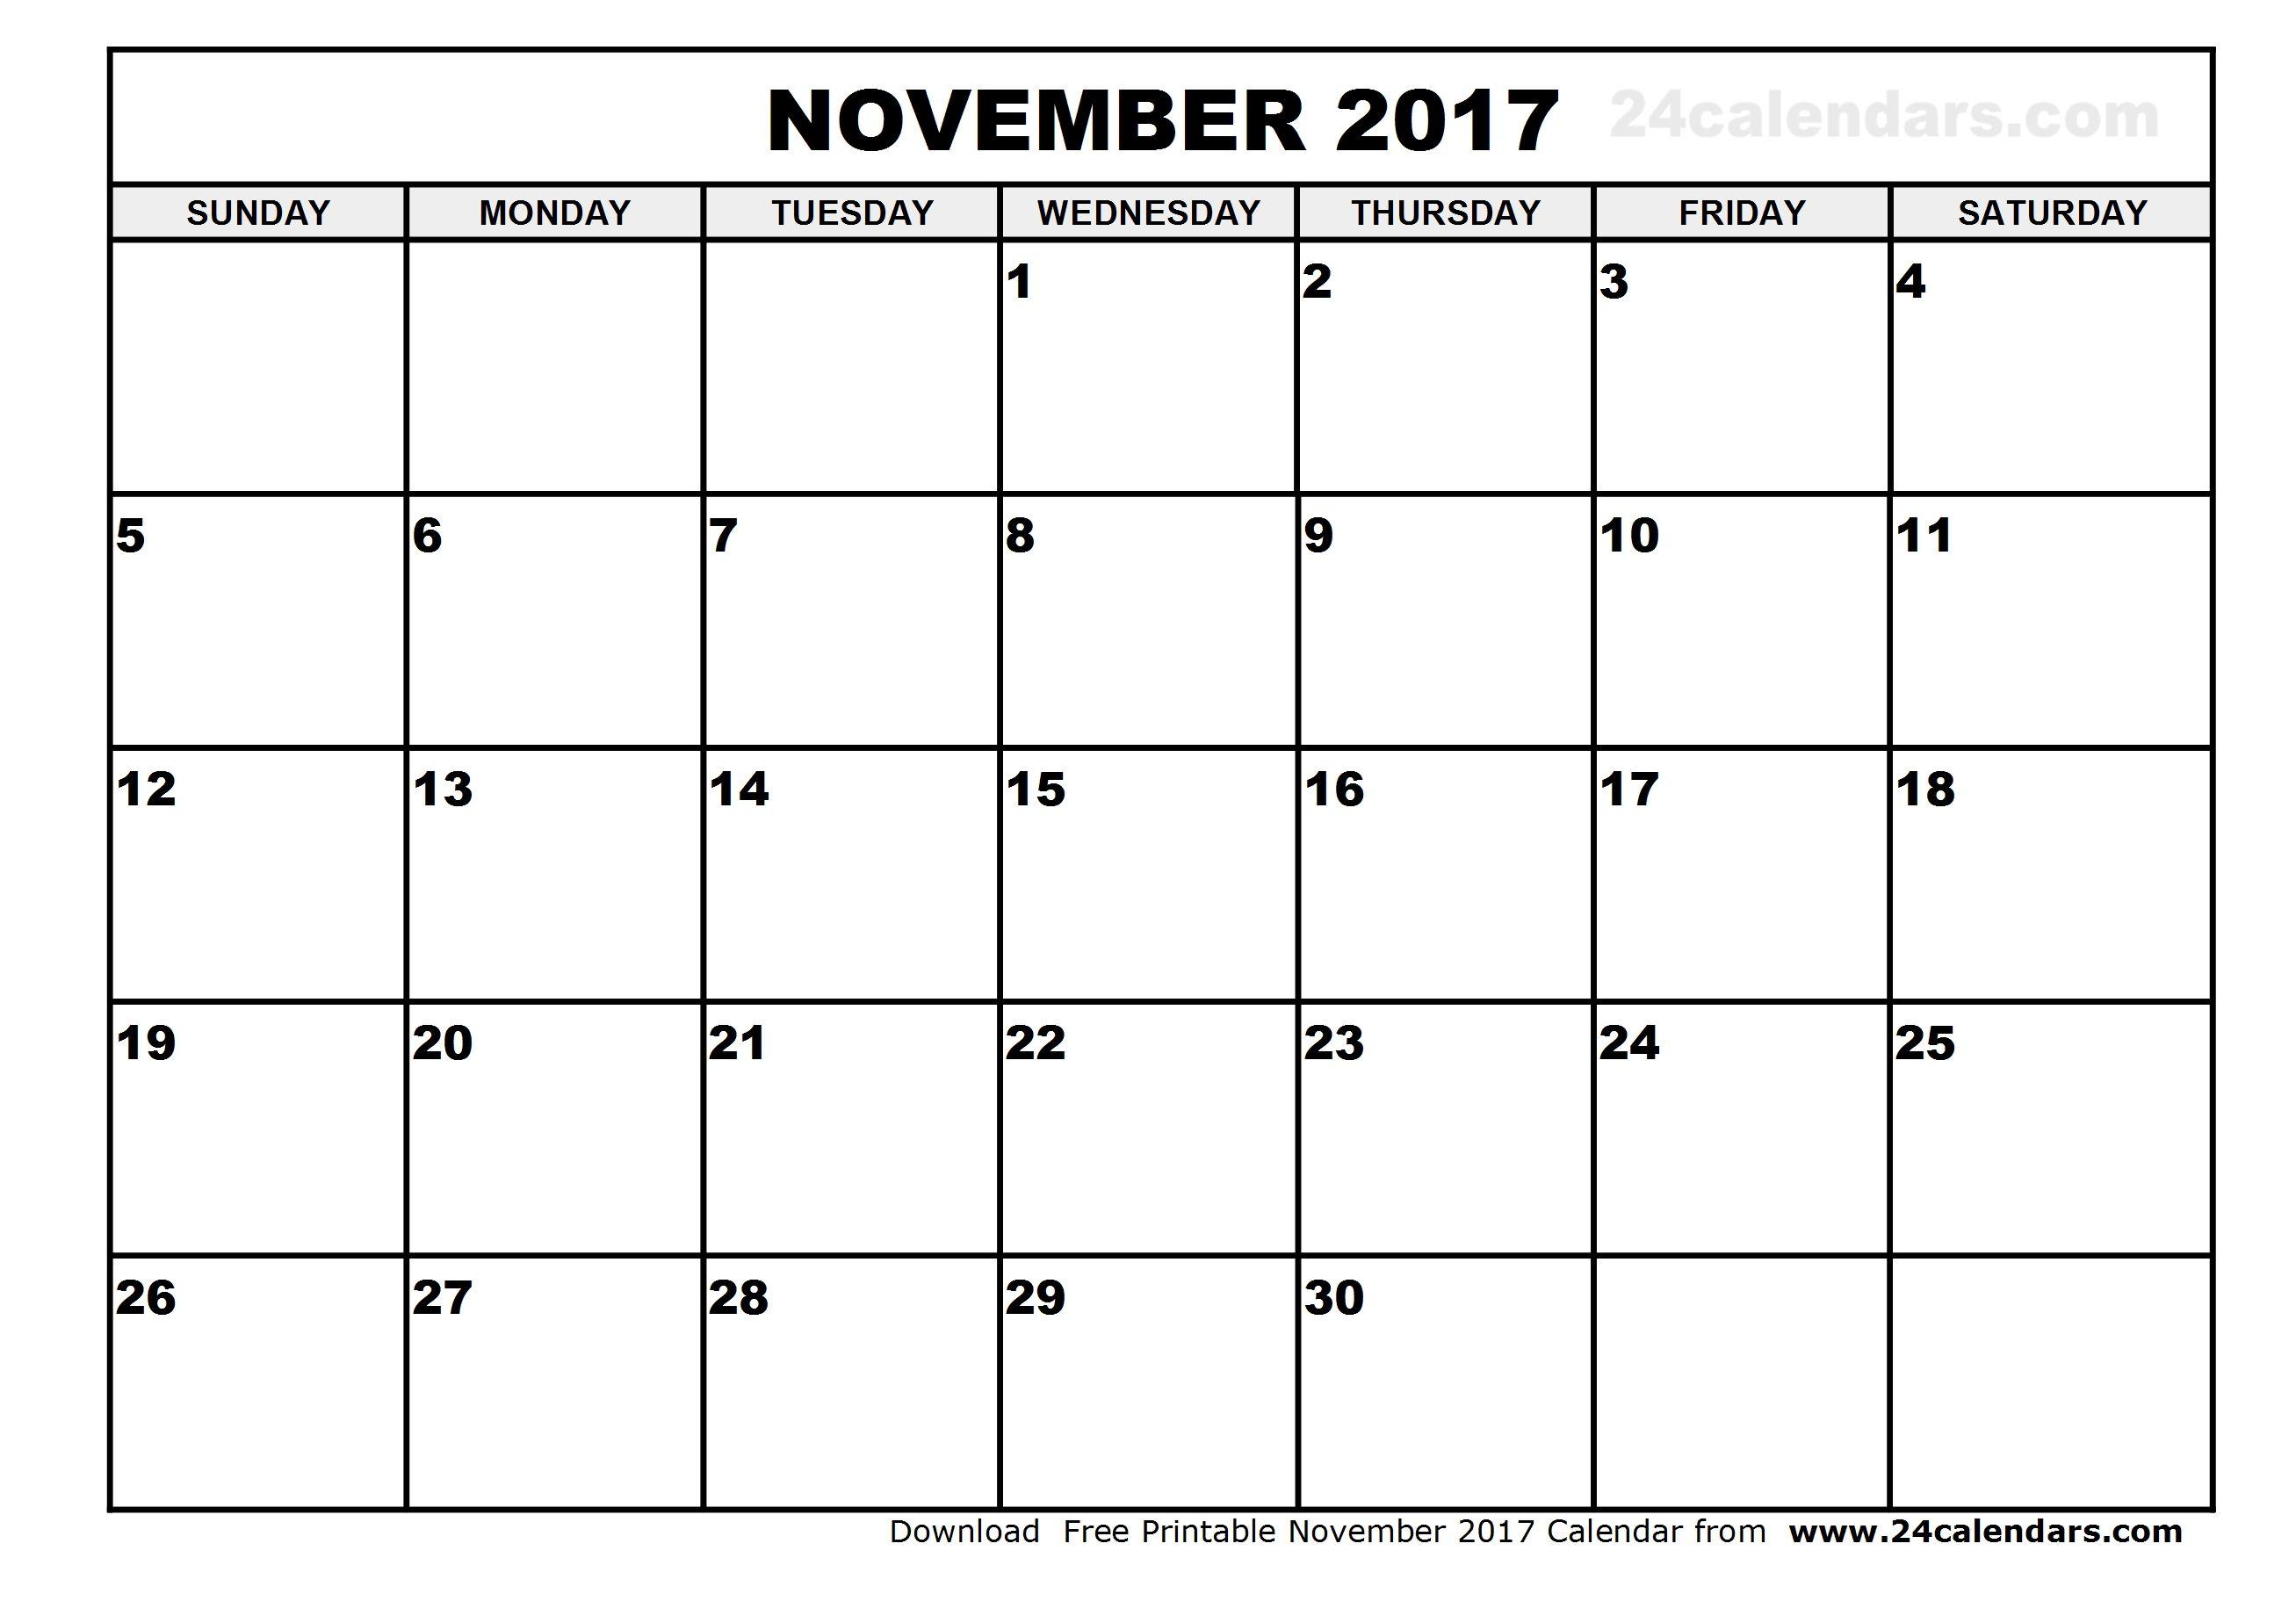 november 2017 calendar printable template with holidays pdf usa uk november calendar november 2017 printable calendar template